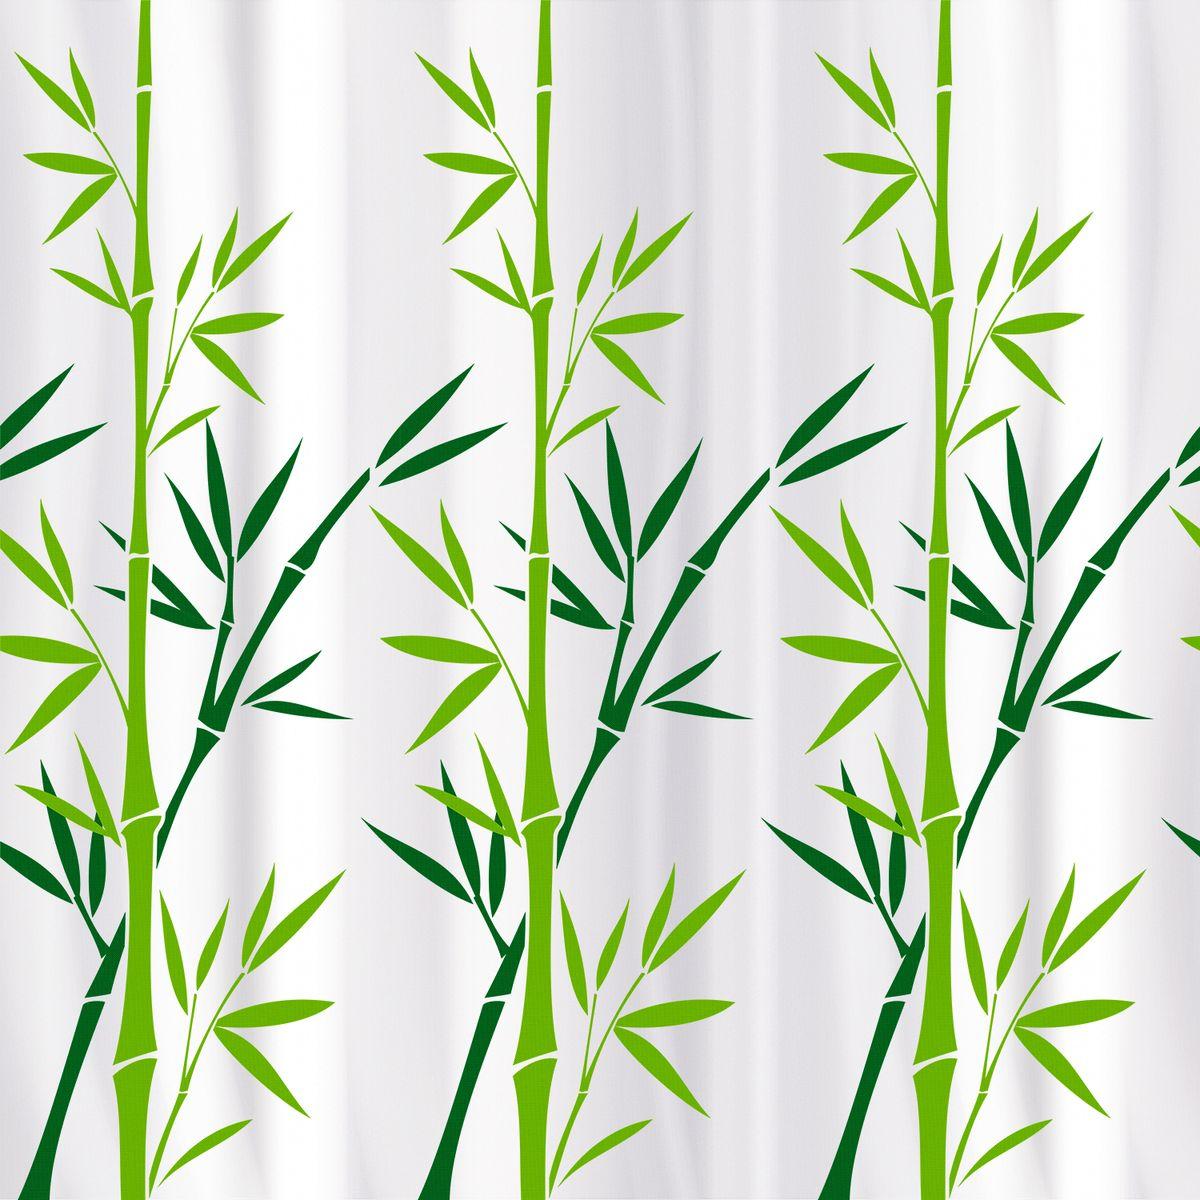 Штора для ванной Tatkraft Bamboo Green Textile, цвет: белый, зеленый, 180 х 180 см tatkraft mega lock